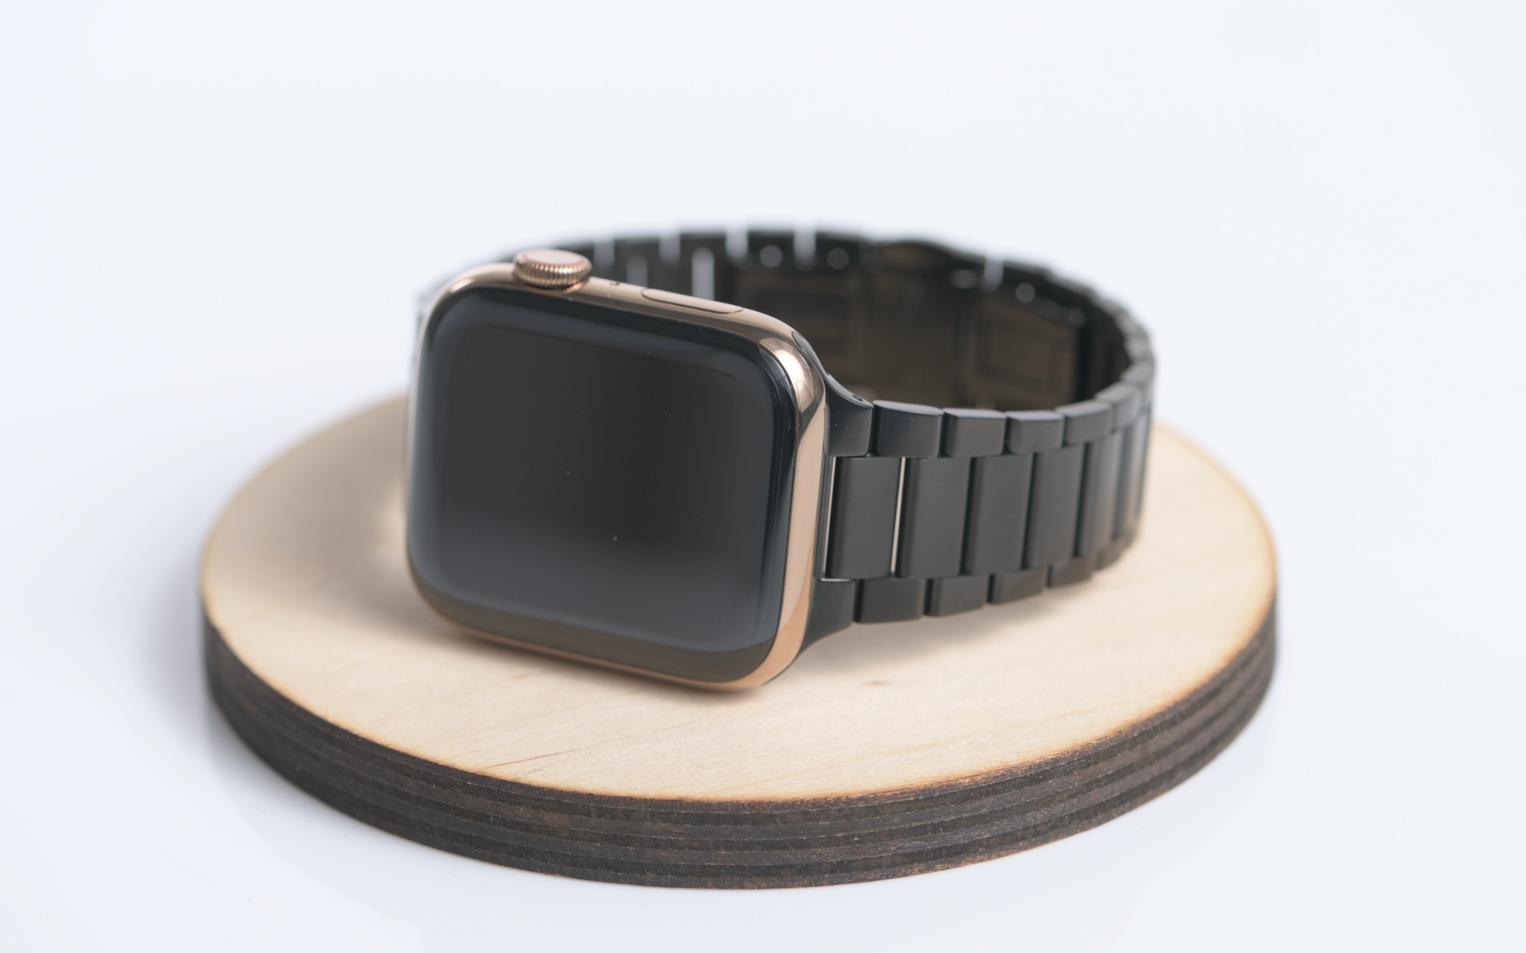 Apple Watch Gold Case